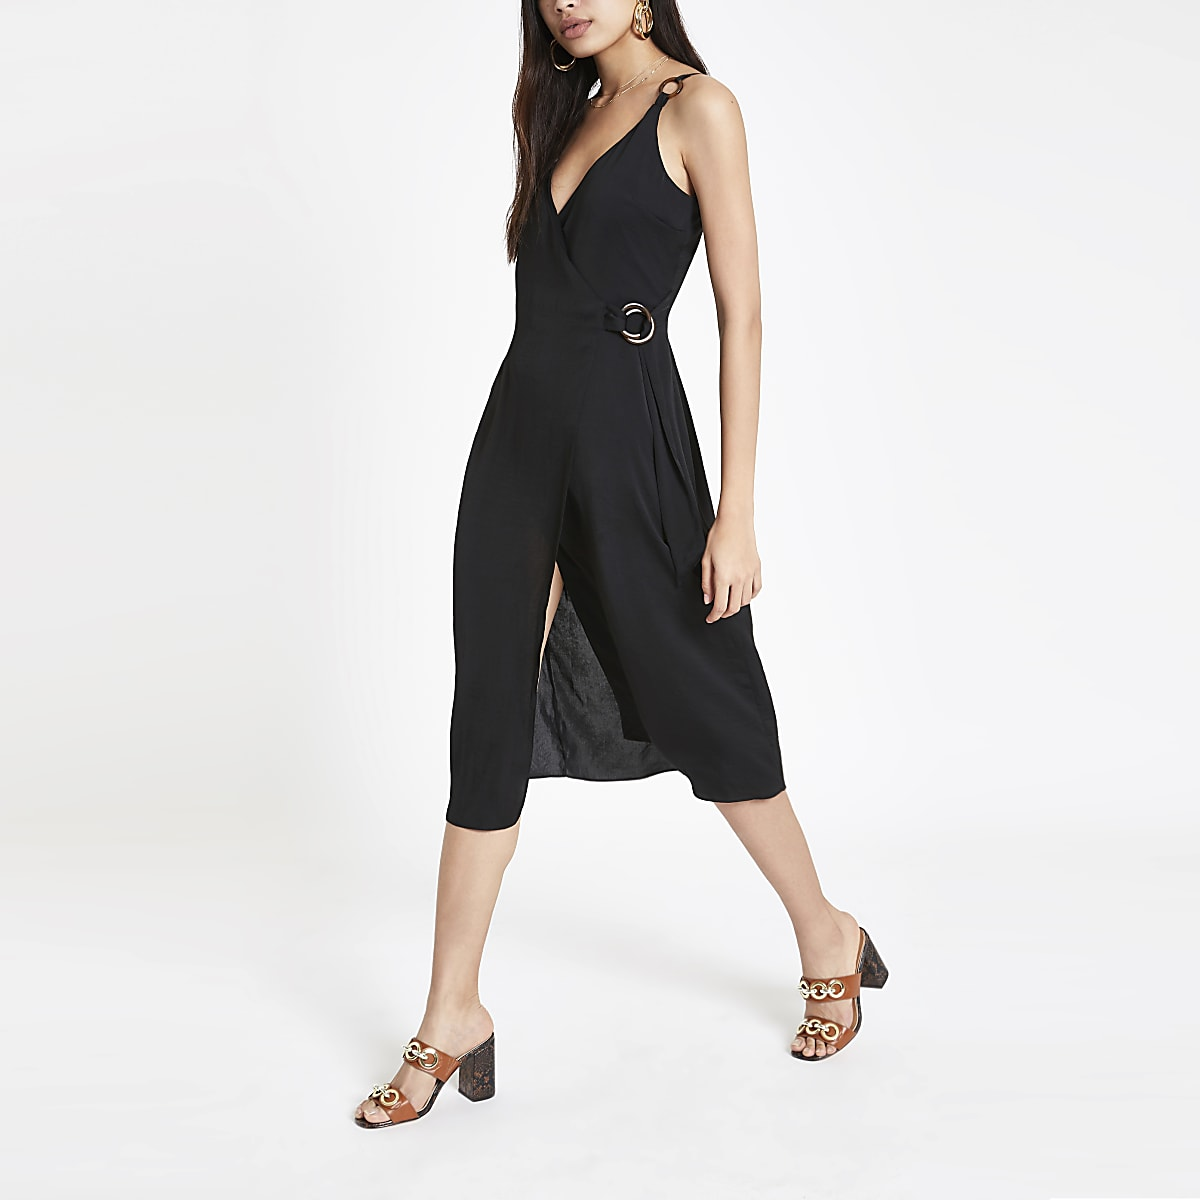 Black wrap slip dress